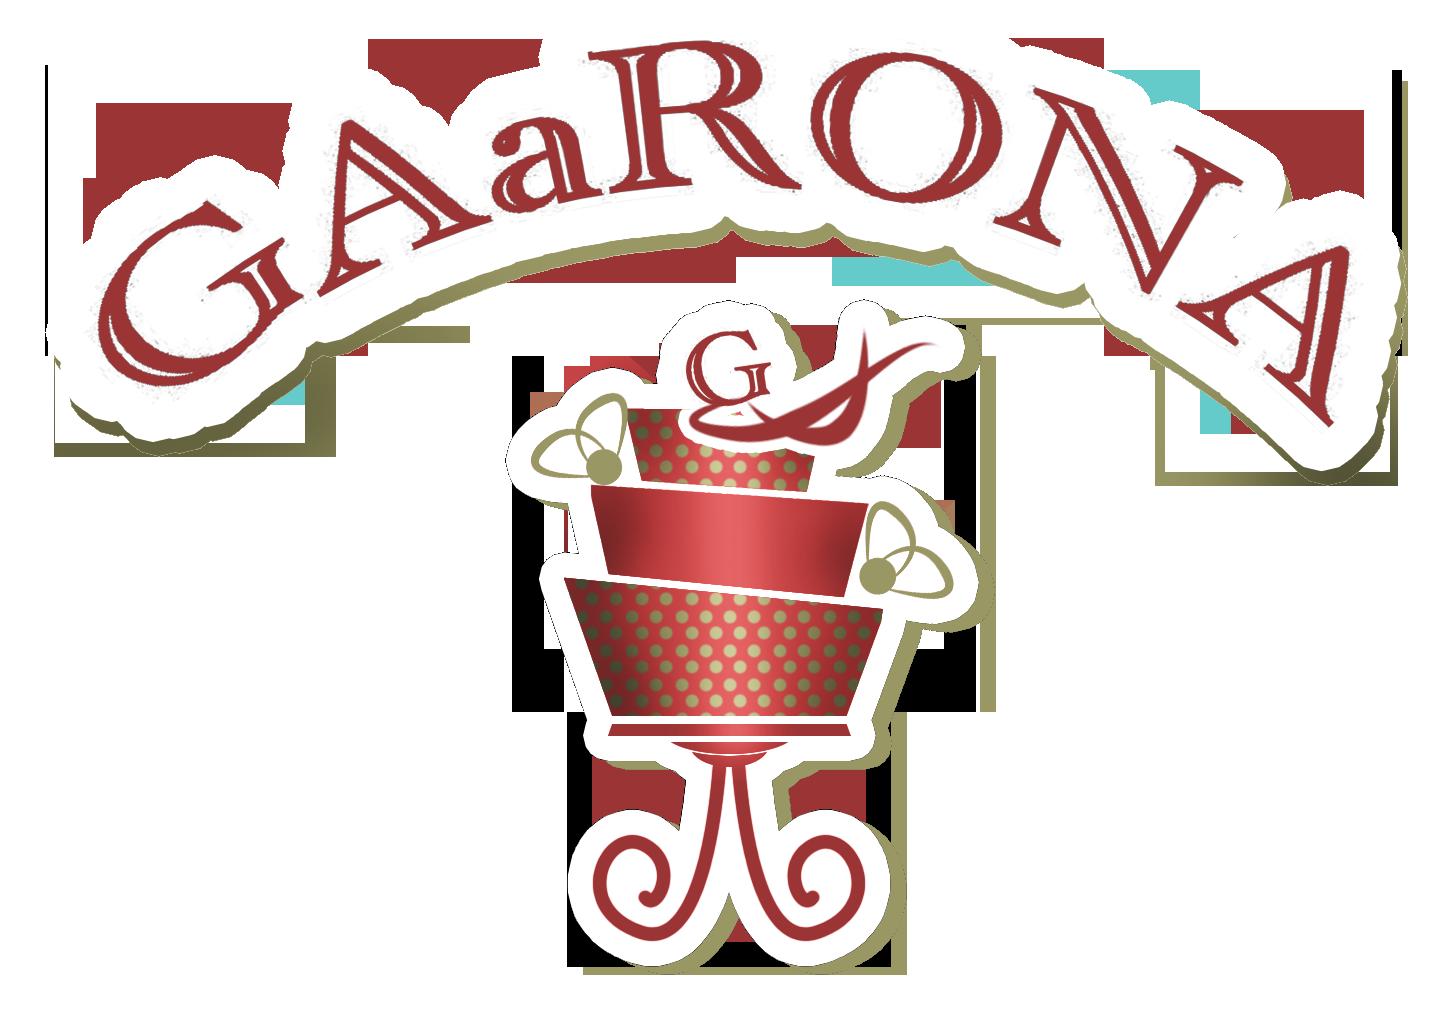 www.gaarona.sk